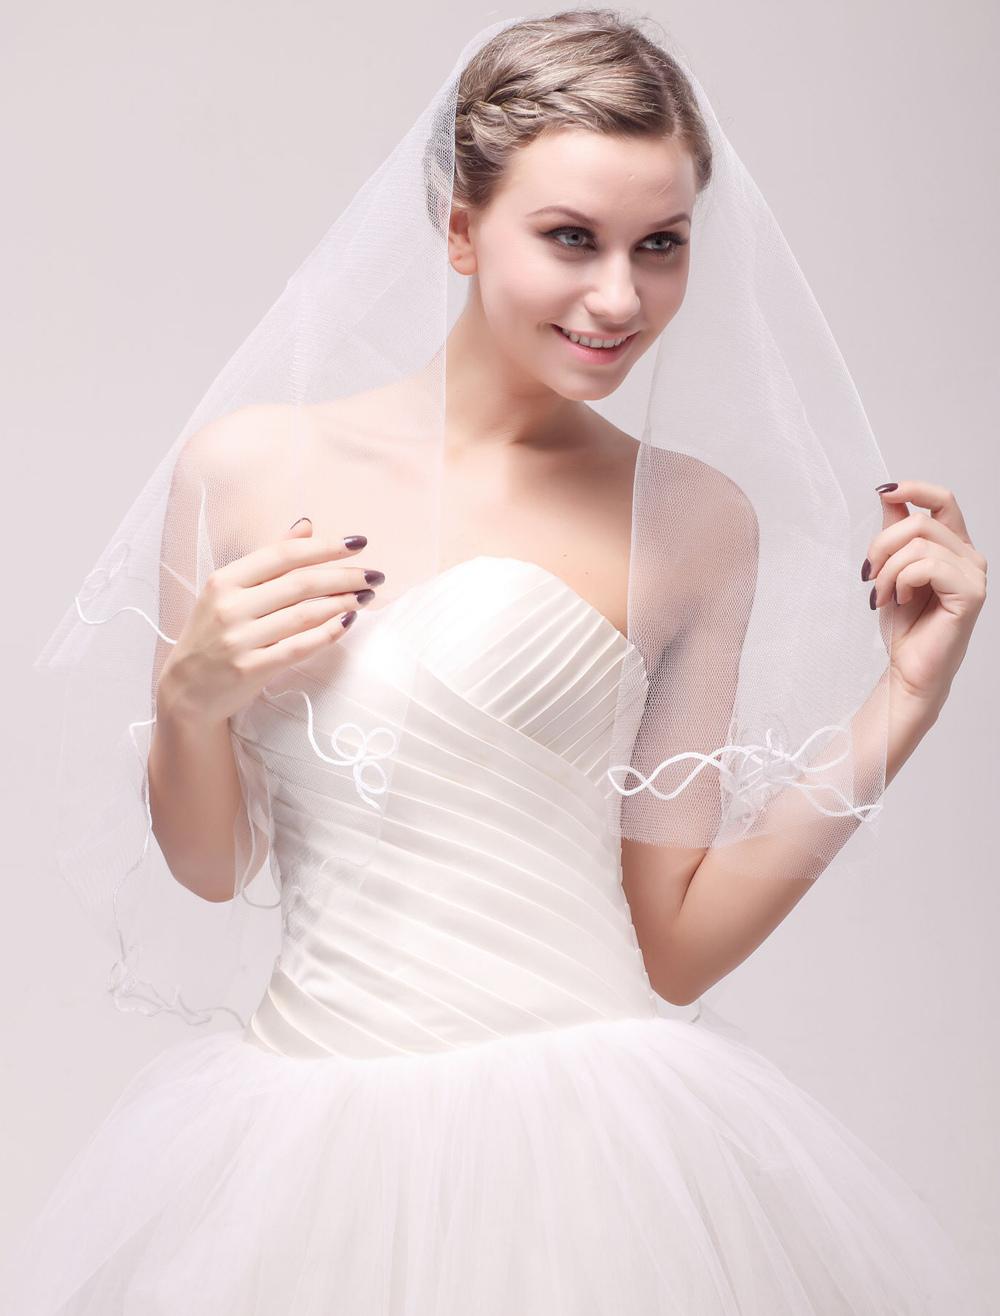 Ivory Lace Net One-Tier Applique Bridal Wedding Veil